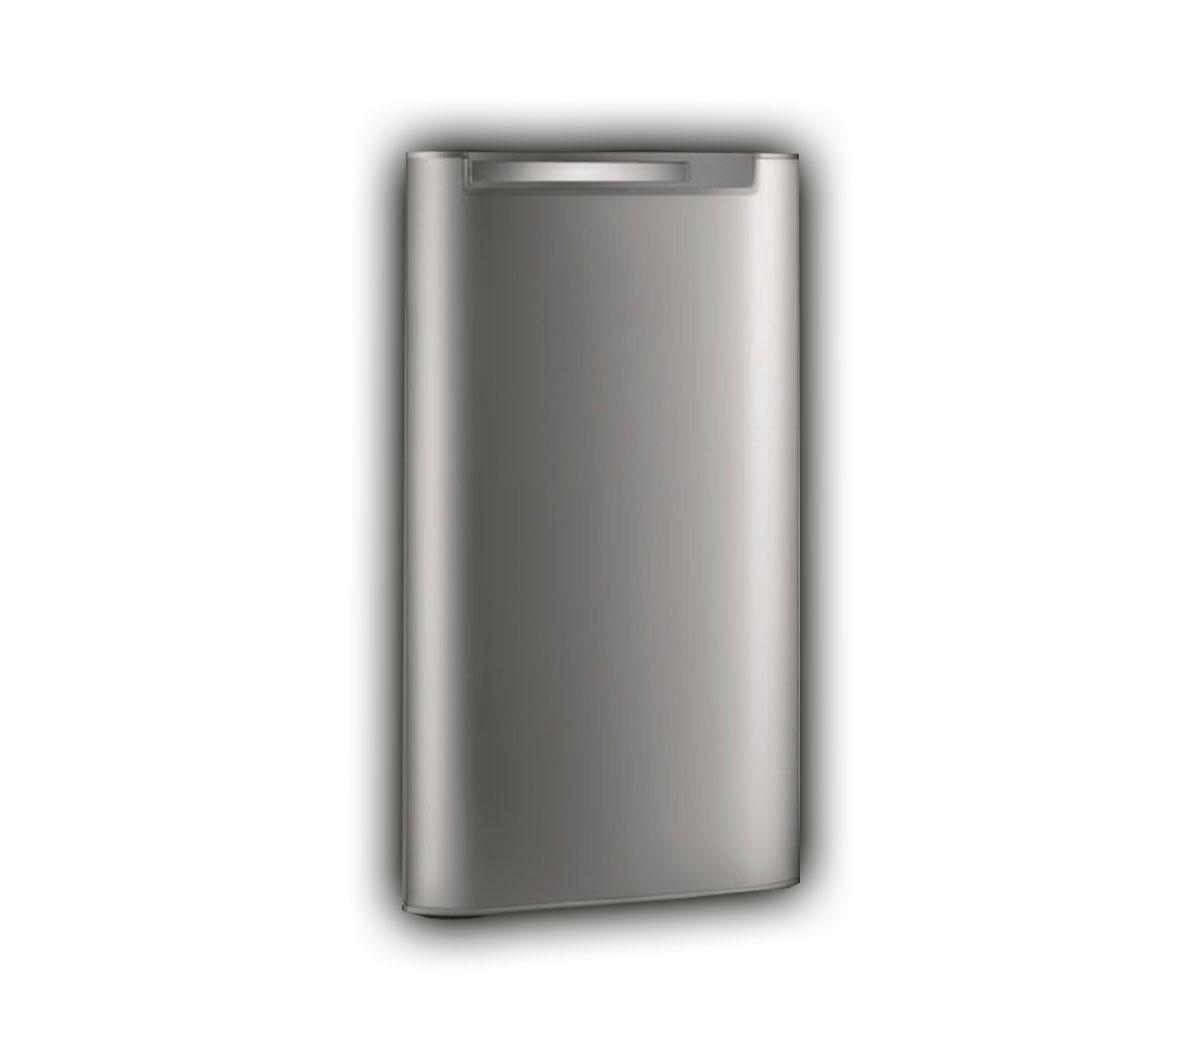 Porta Inferior Branca Freezer Df34 Df35 Df37 Df34R Dfw35 Df36G